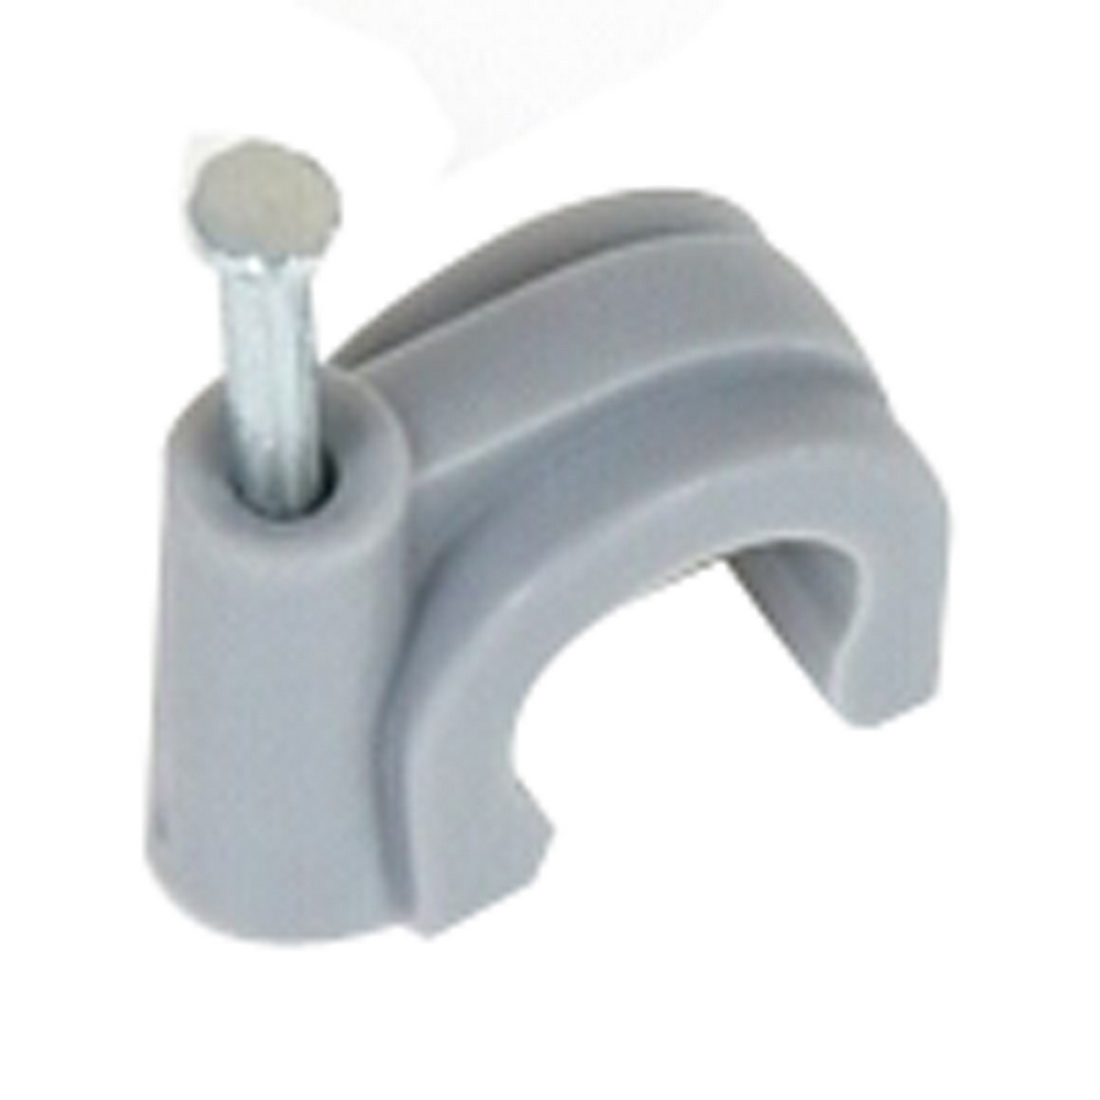 Dux Nail-In Pipe Clip 18 mm Polybutylene BA18